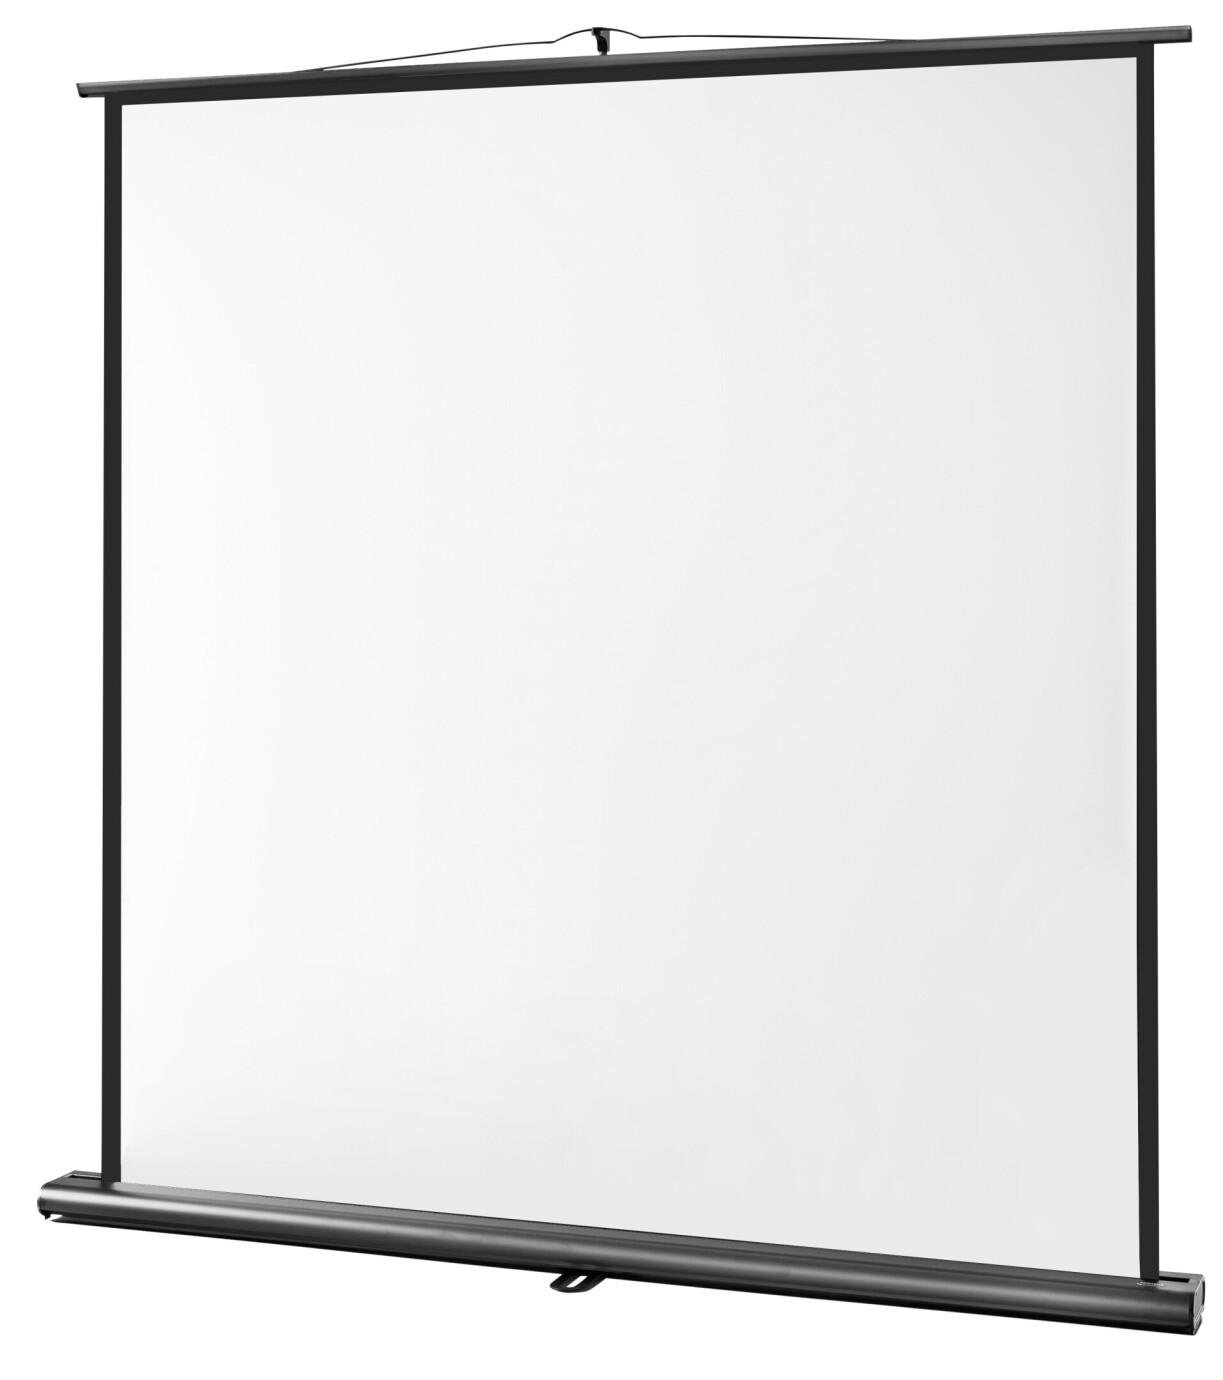 celexon Leinwand Ultramobil Professional 200 x 200 cm